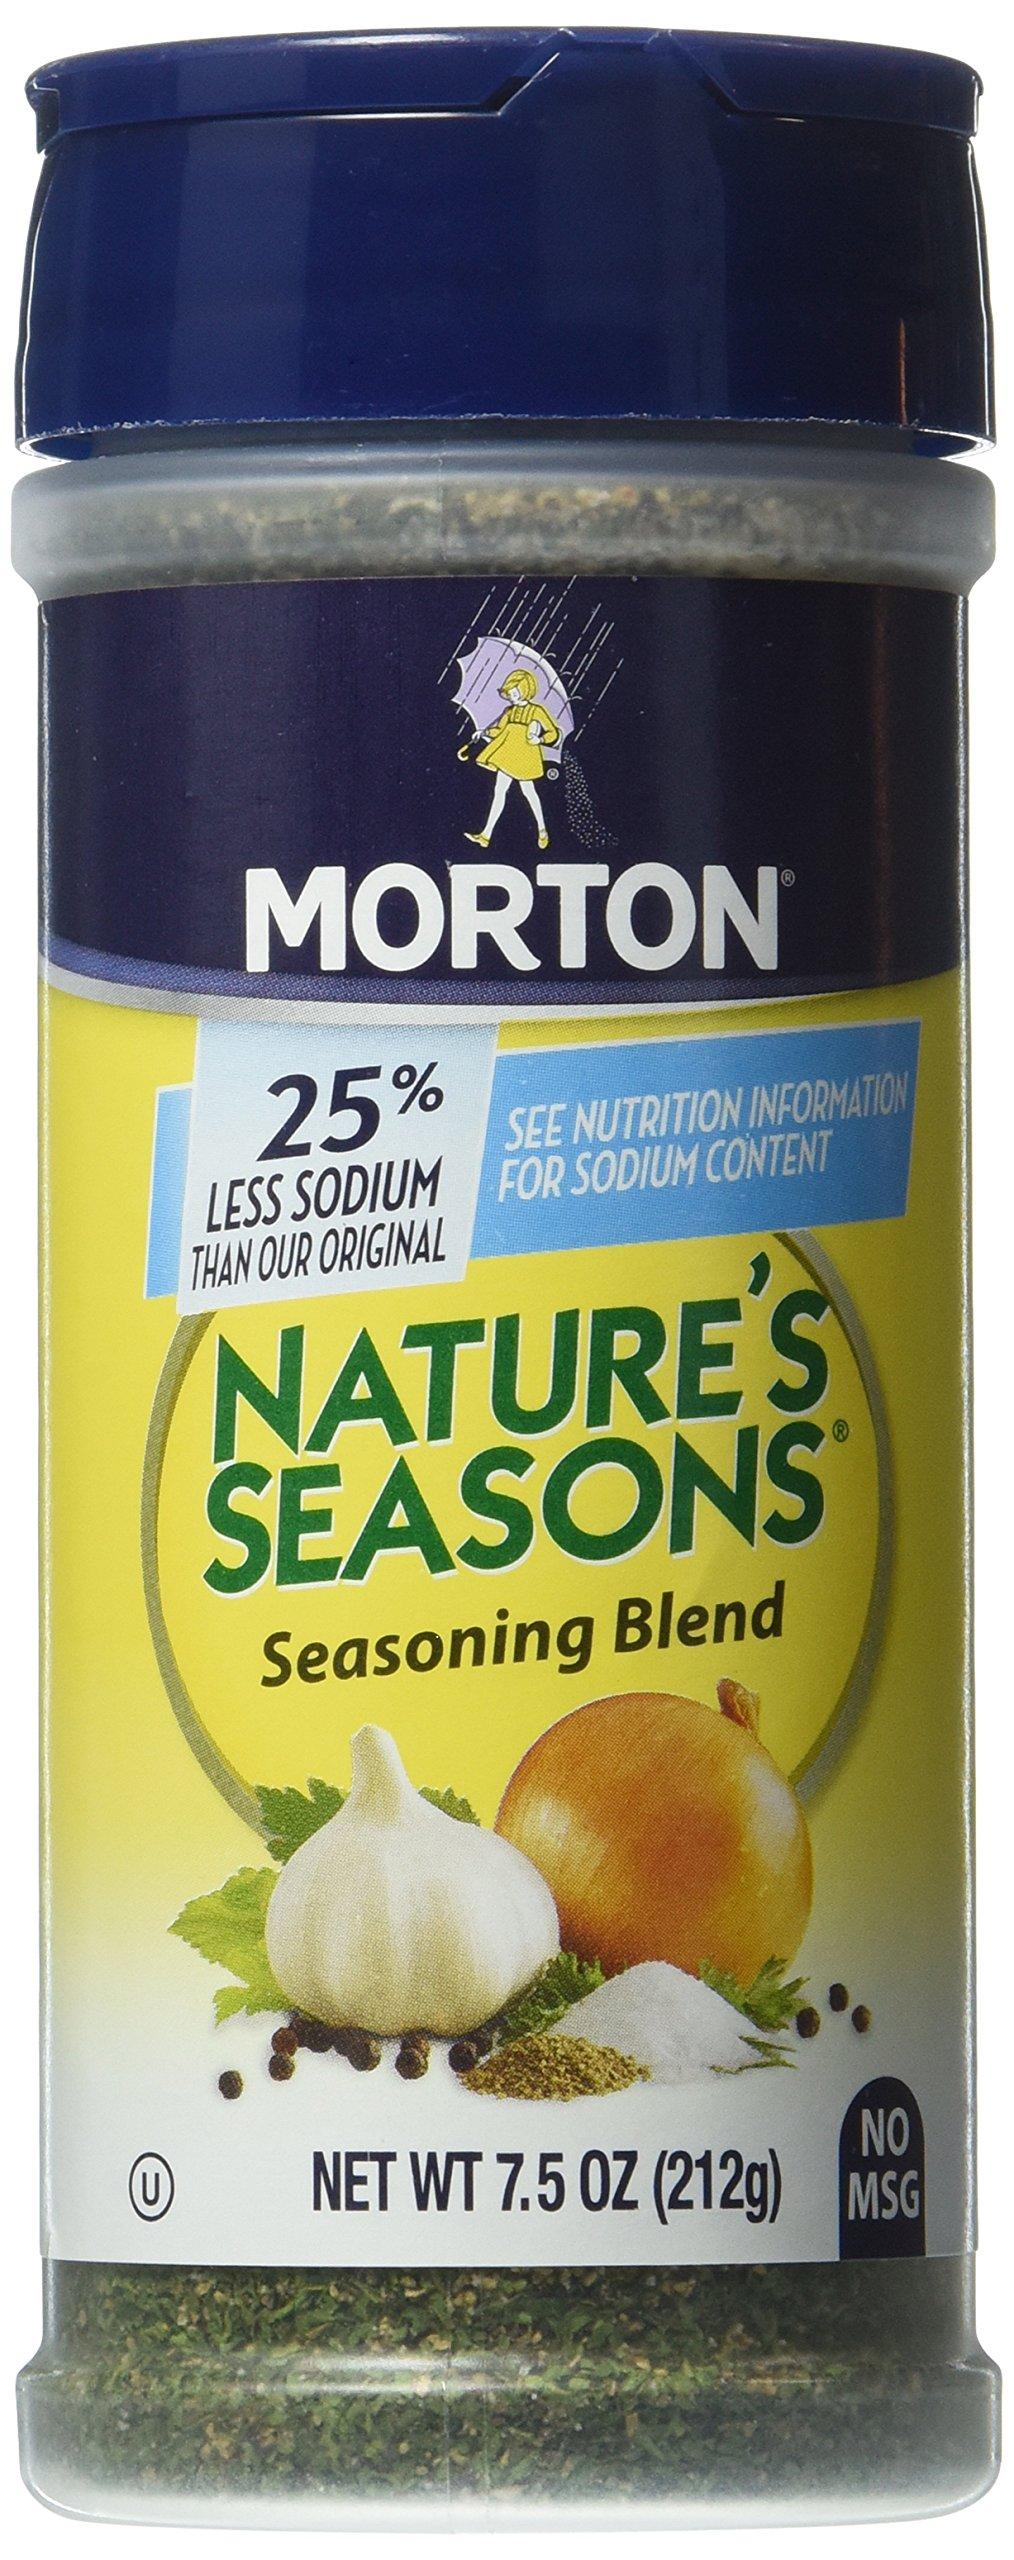 Morton S Nature S Seasons Seasoning Blend   Ounce